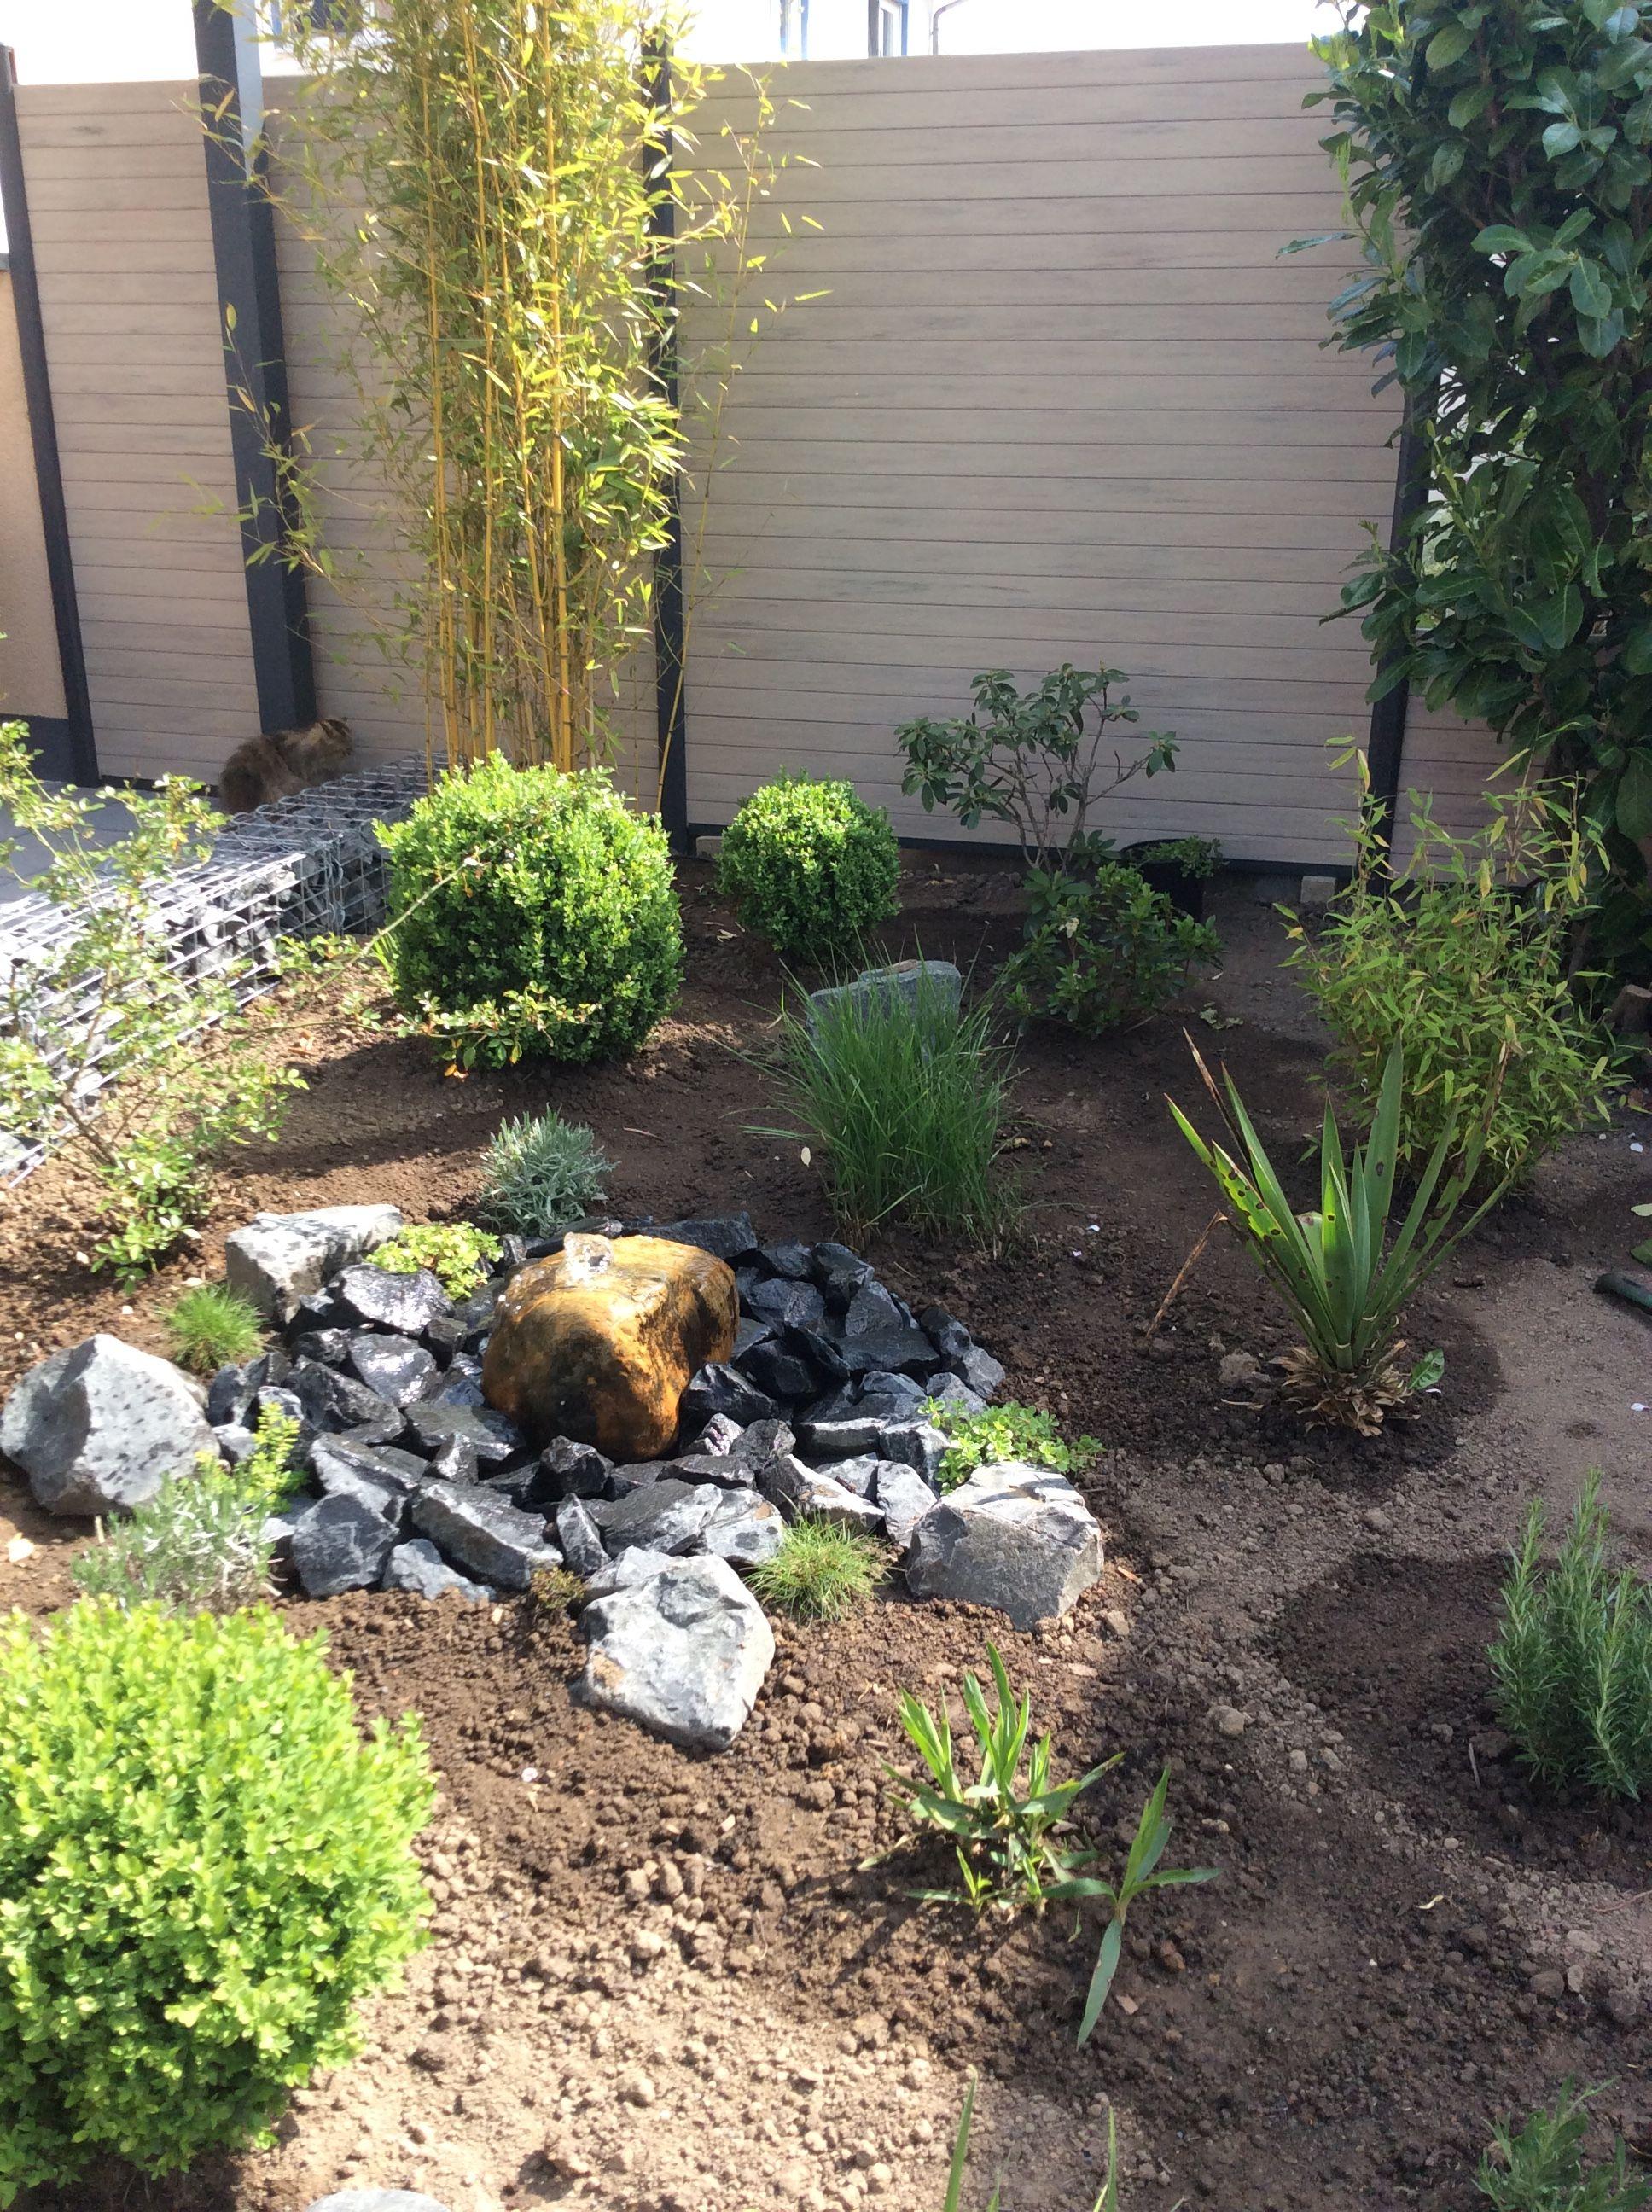 Minigarten Gestalten minigarten gestalten ideen